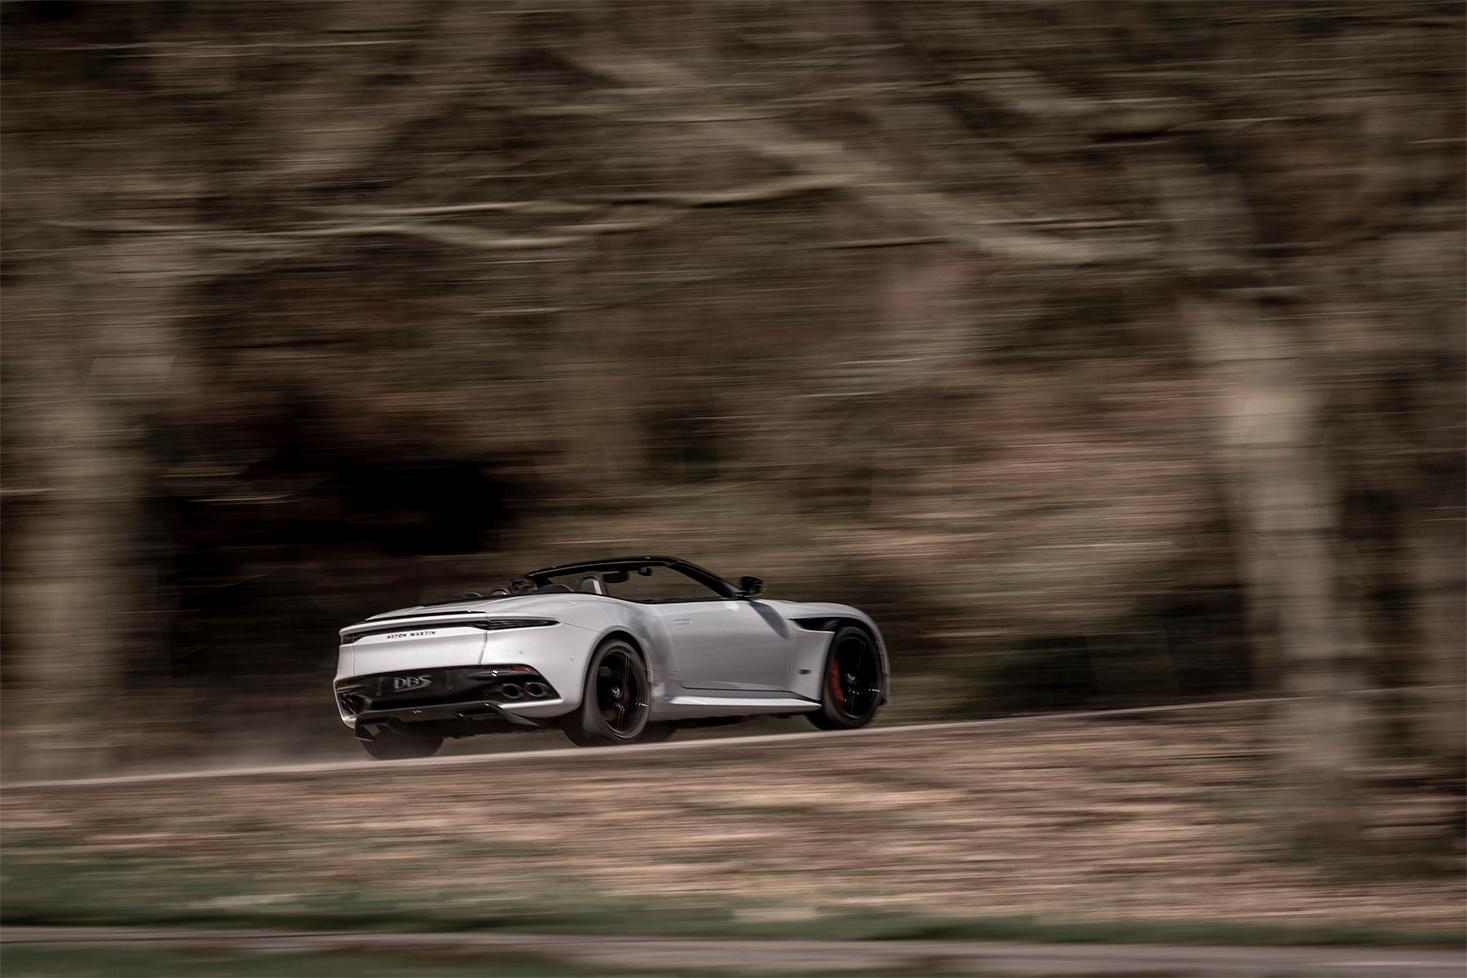 TrackWorthy - Aston Martin DBS Superleggera Volante (5)